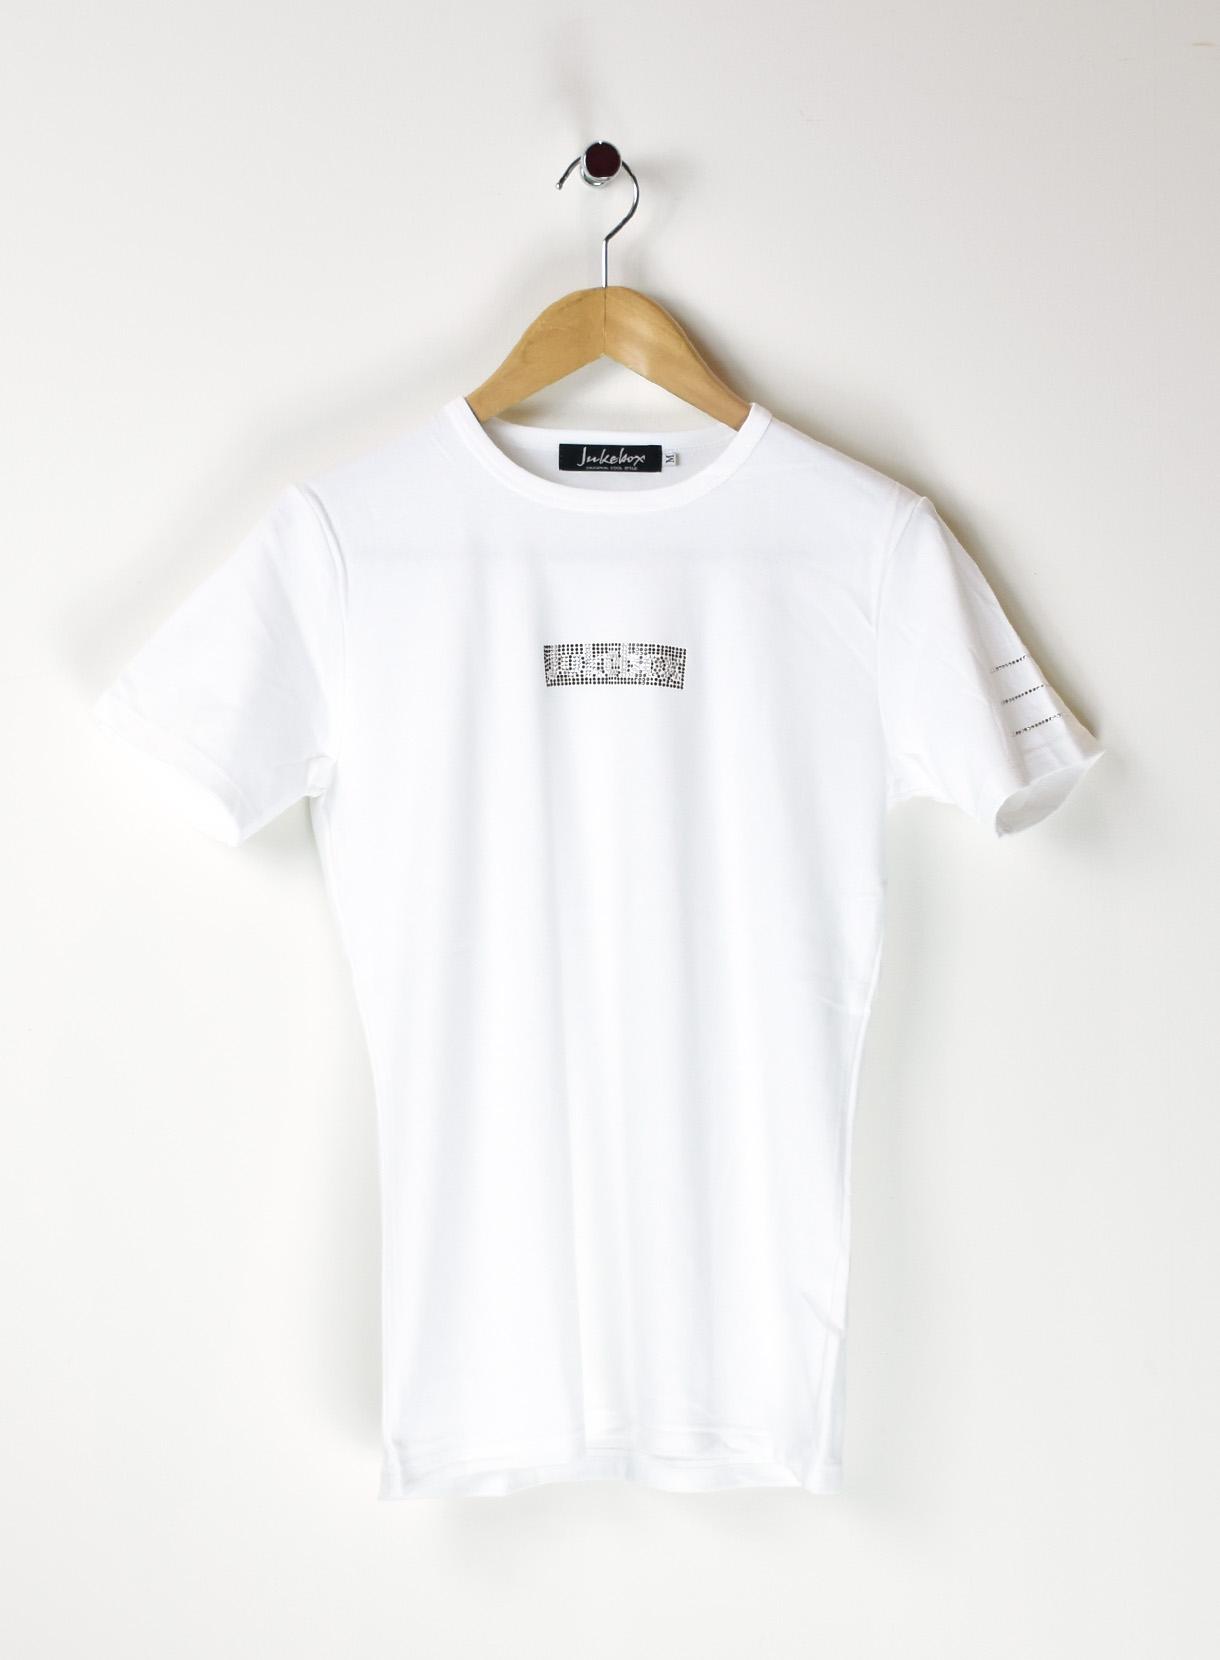 JUKEBOX SWAROVSKI Tシャツ(フロント boxロゴ②柄+肩ライン)